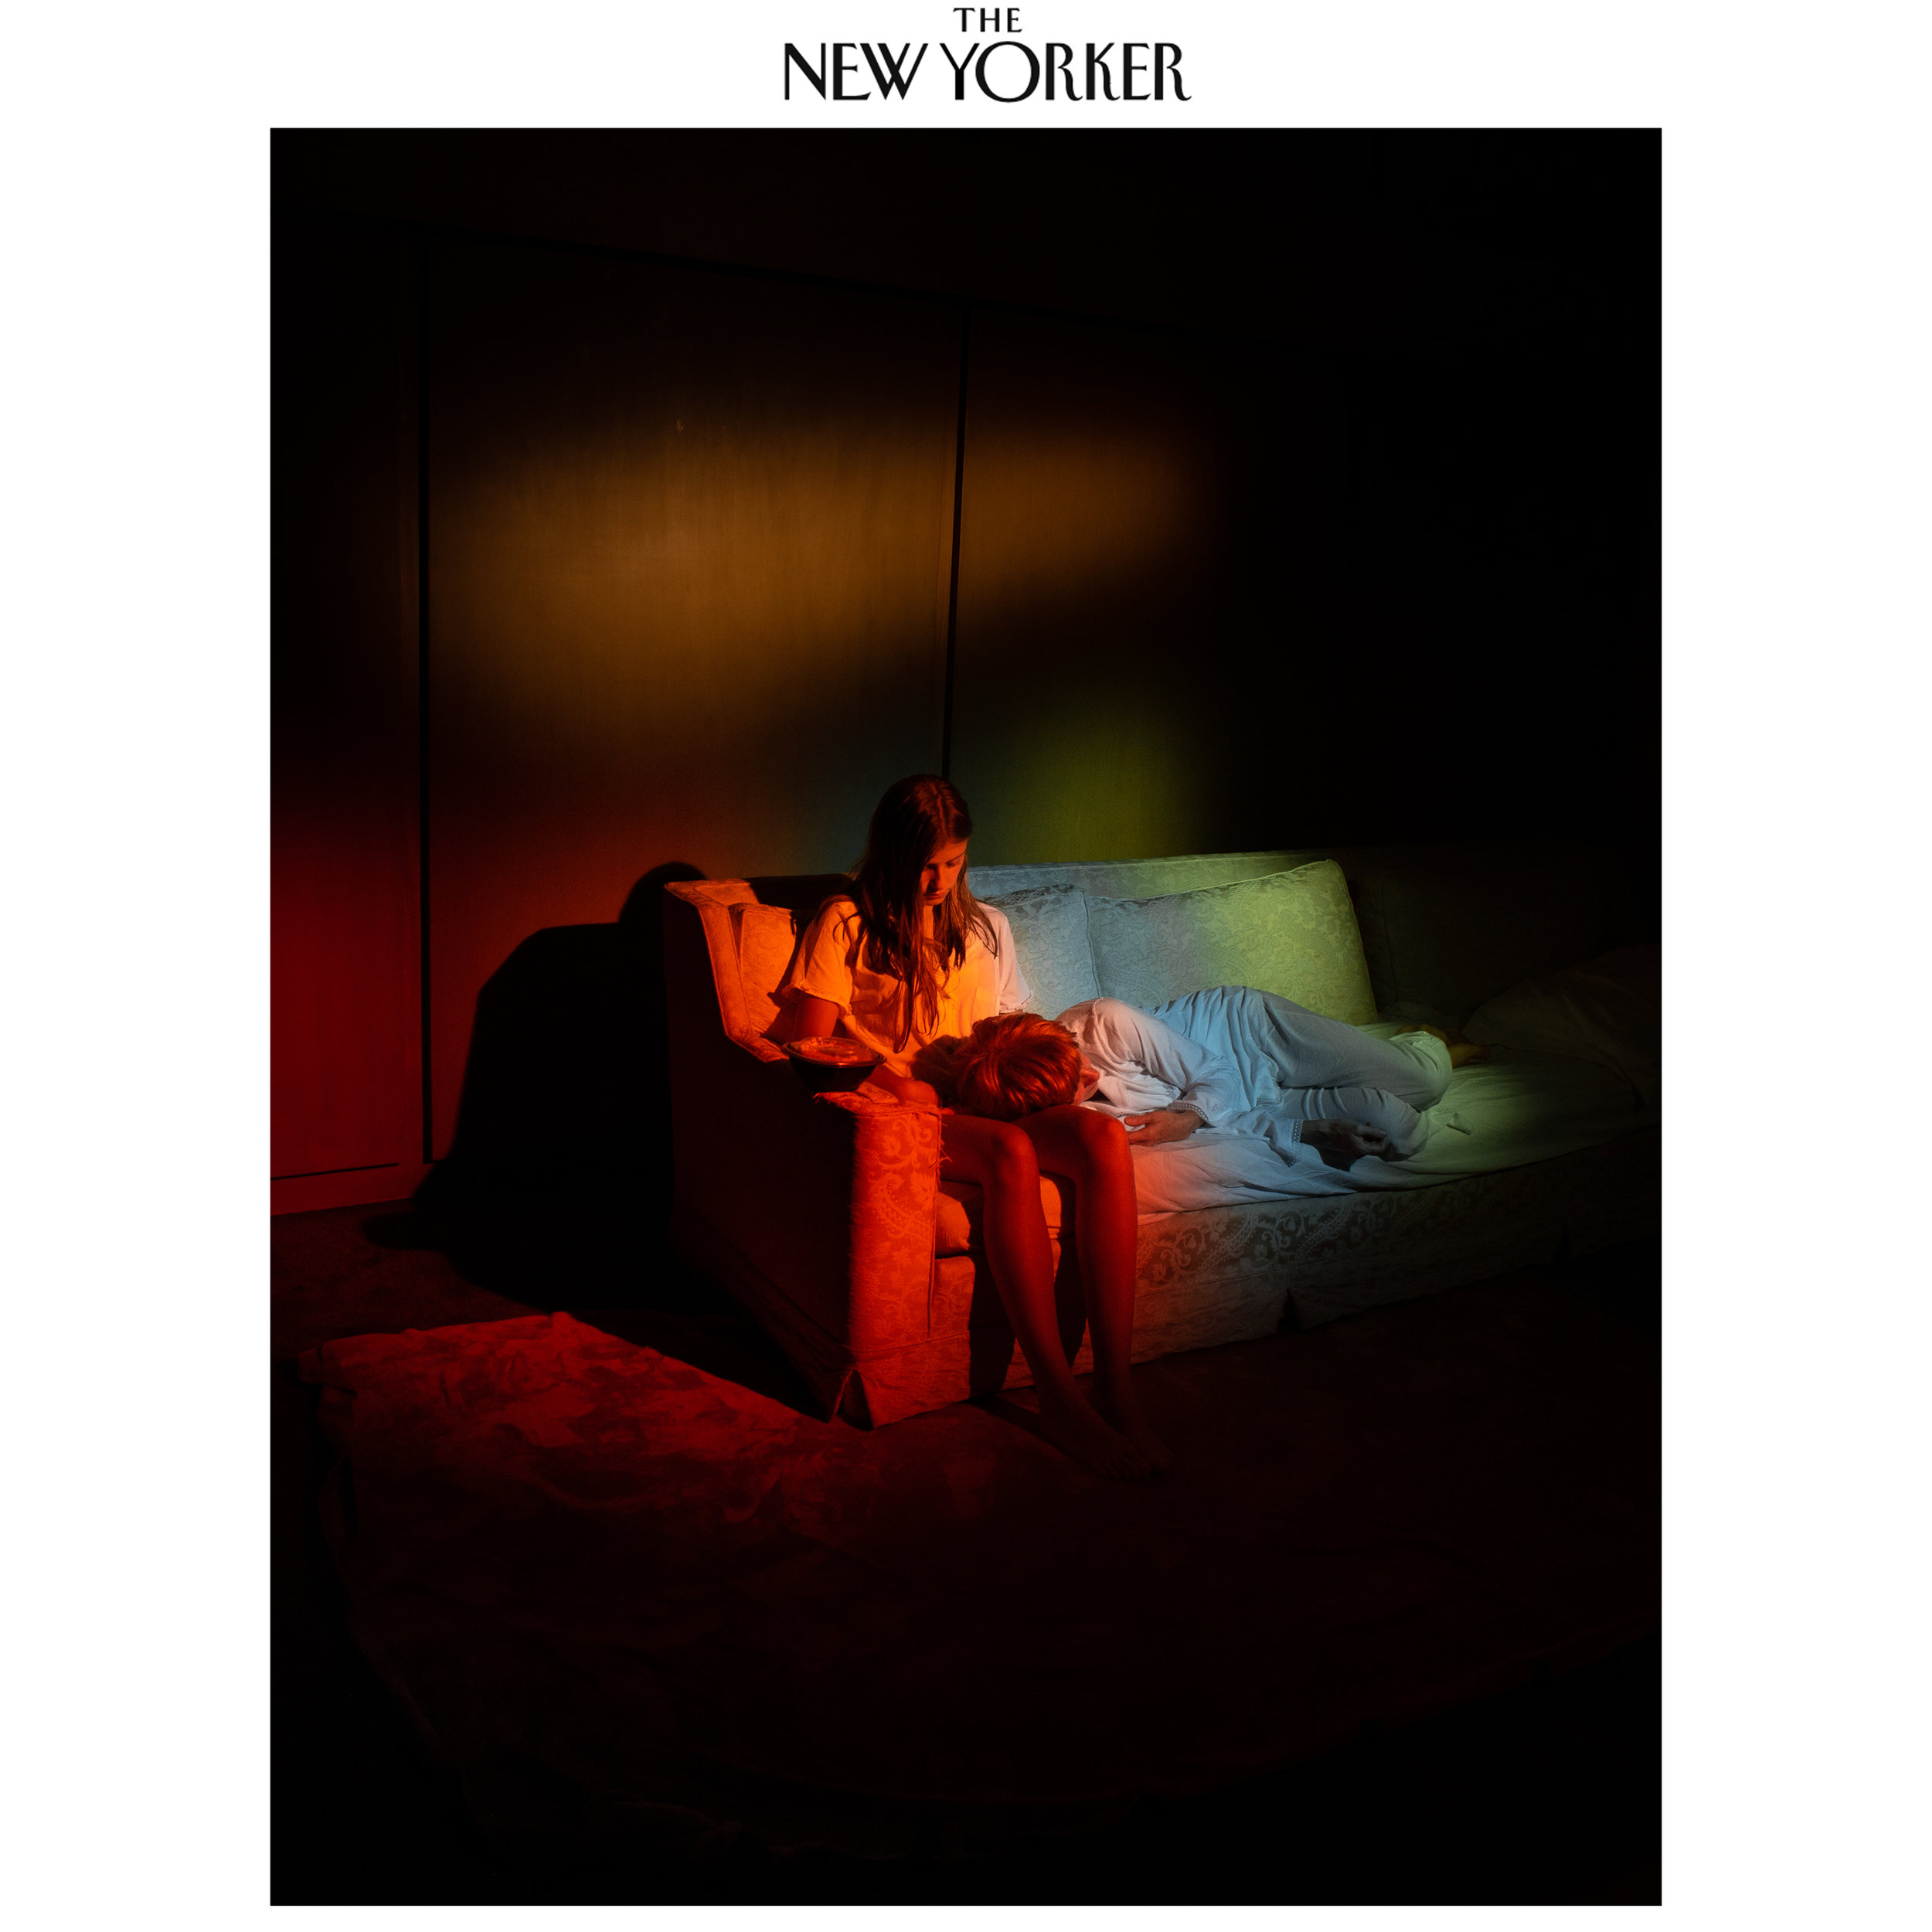 The New Yorker Tania Franco Klein